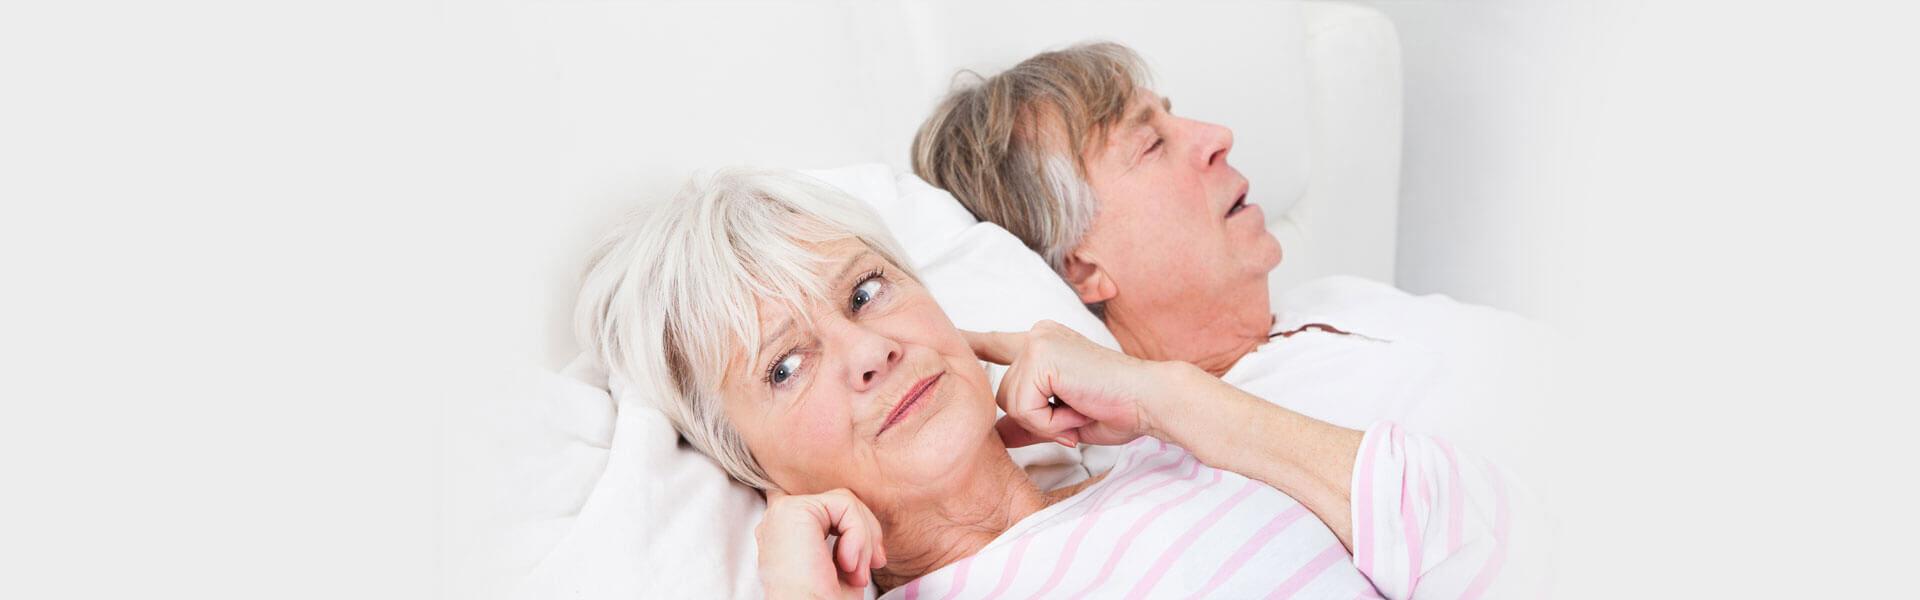 Dental Sleep Apnea in Dublin, CA